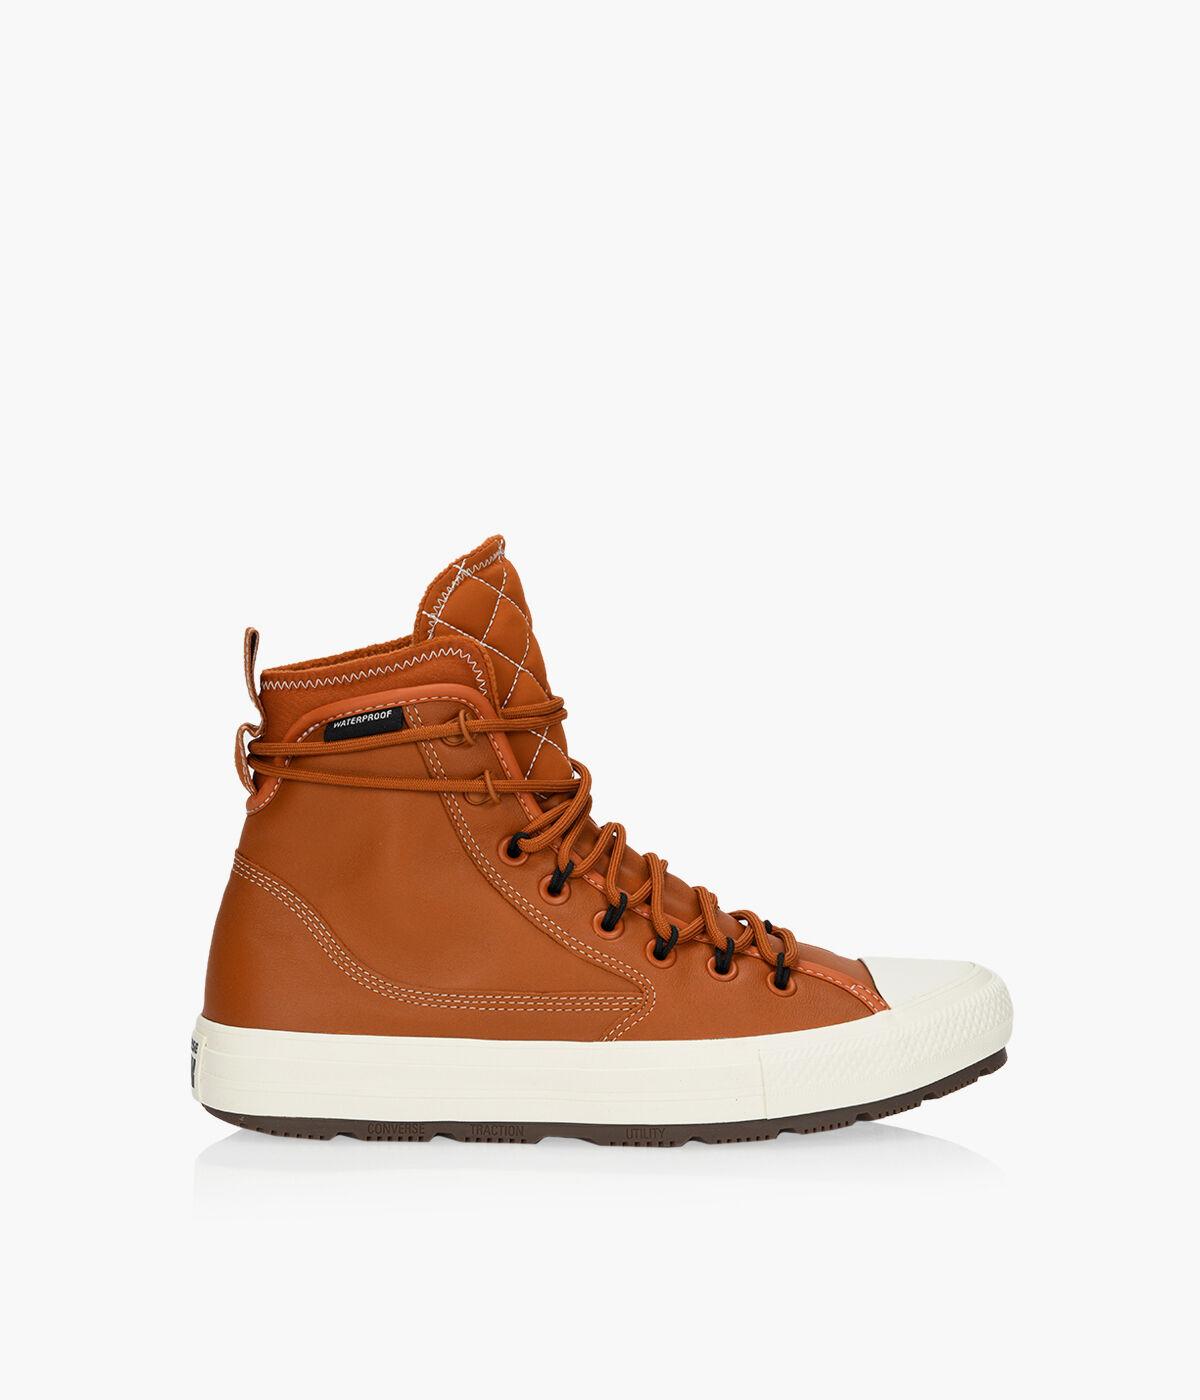 Sandals for Women, Men, Kids | Browns Shoes